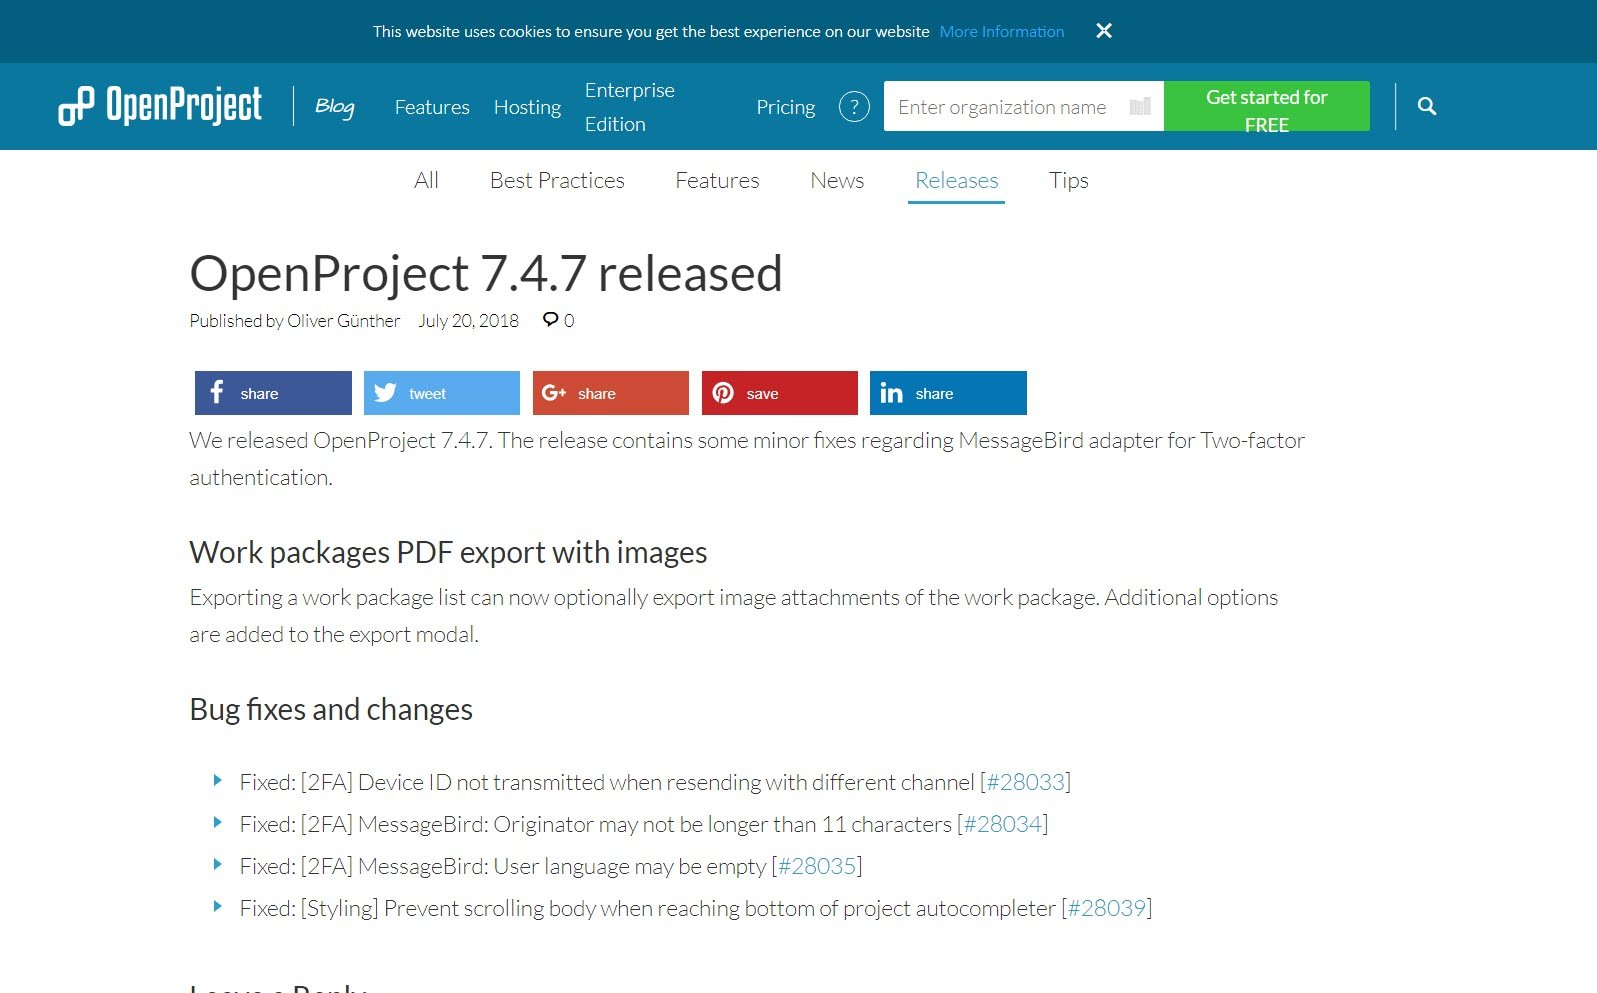 openproject-7-4-7-fehlerbehebungsupdate-internetblogger-de